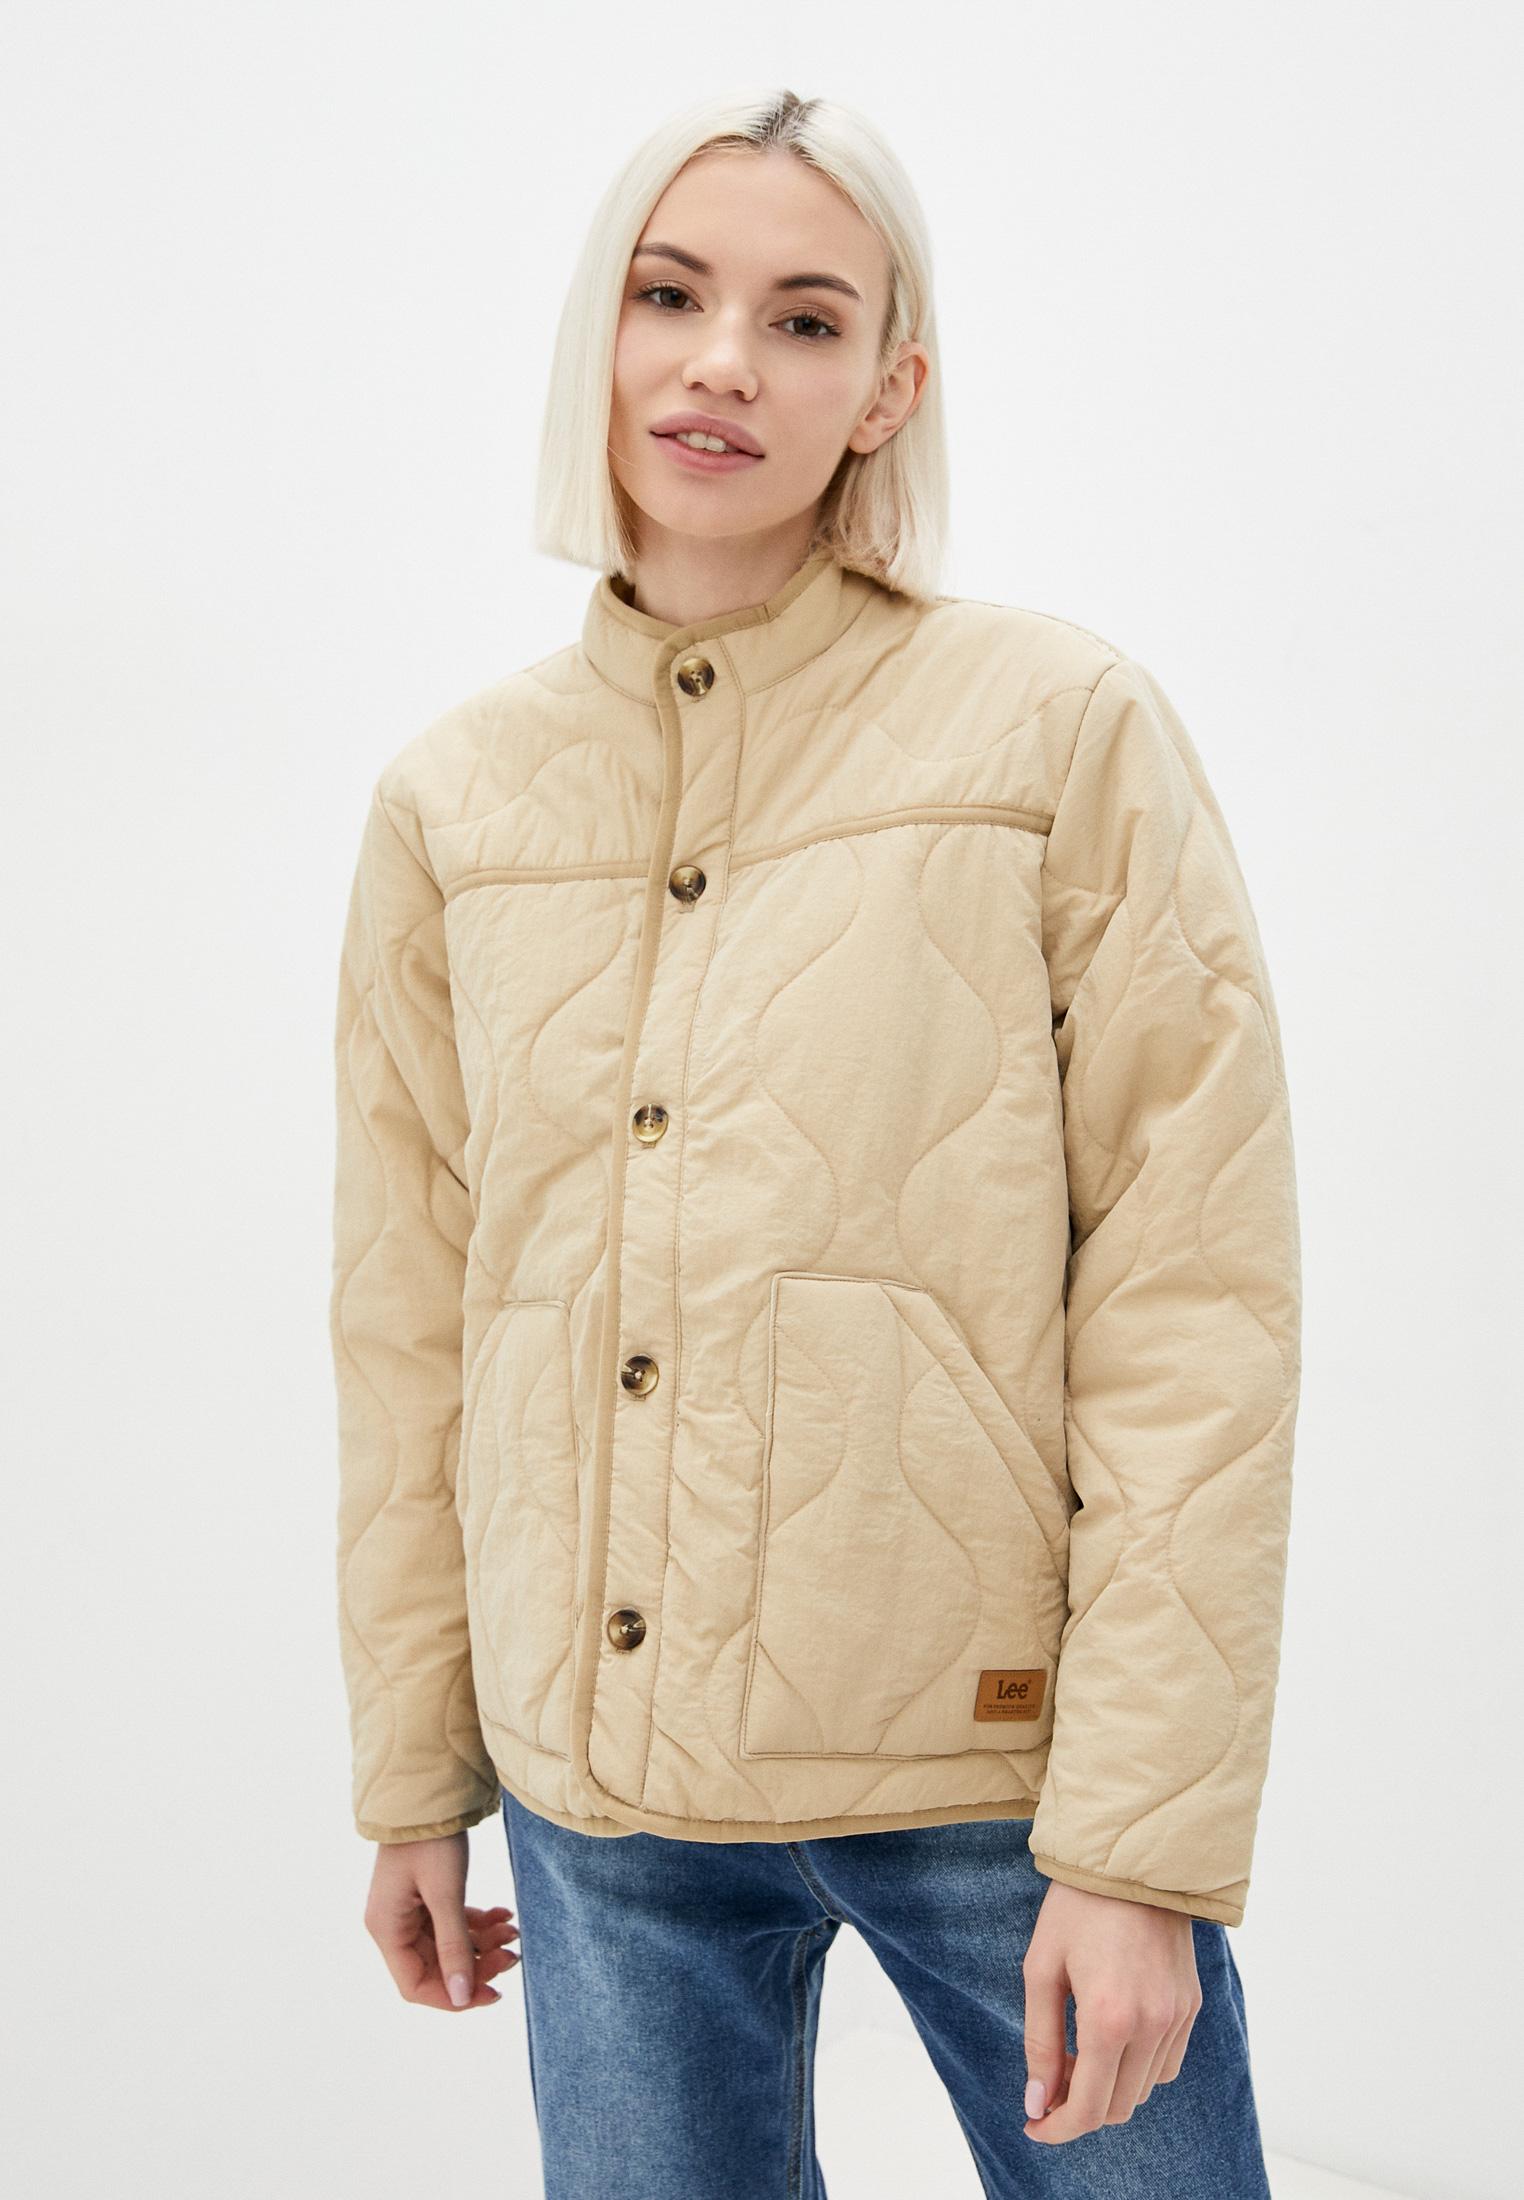 Утепленная куртка Lee (Ли) Куртка утепленная Lee